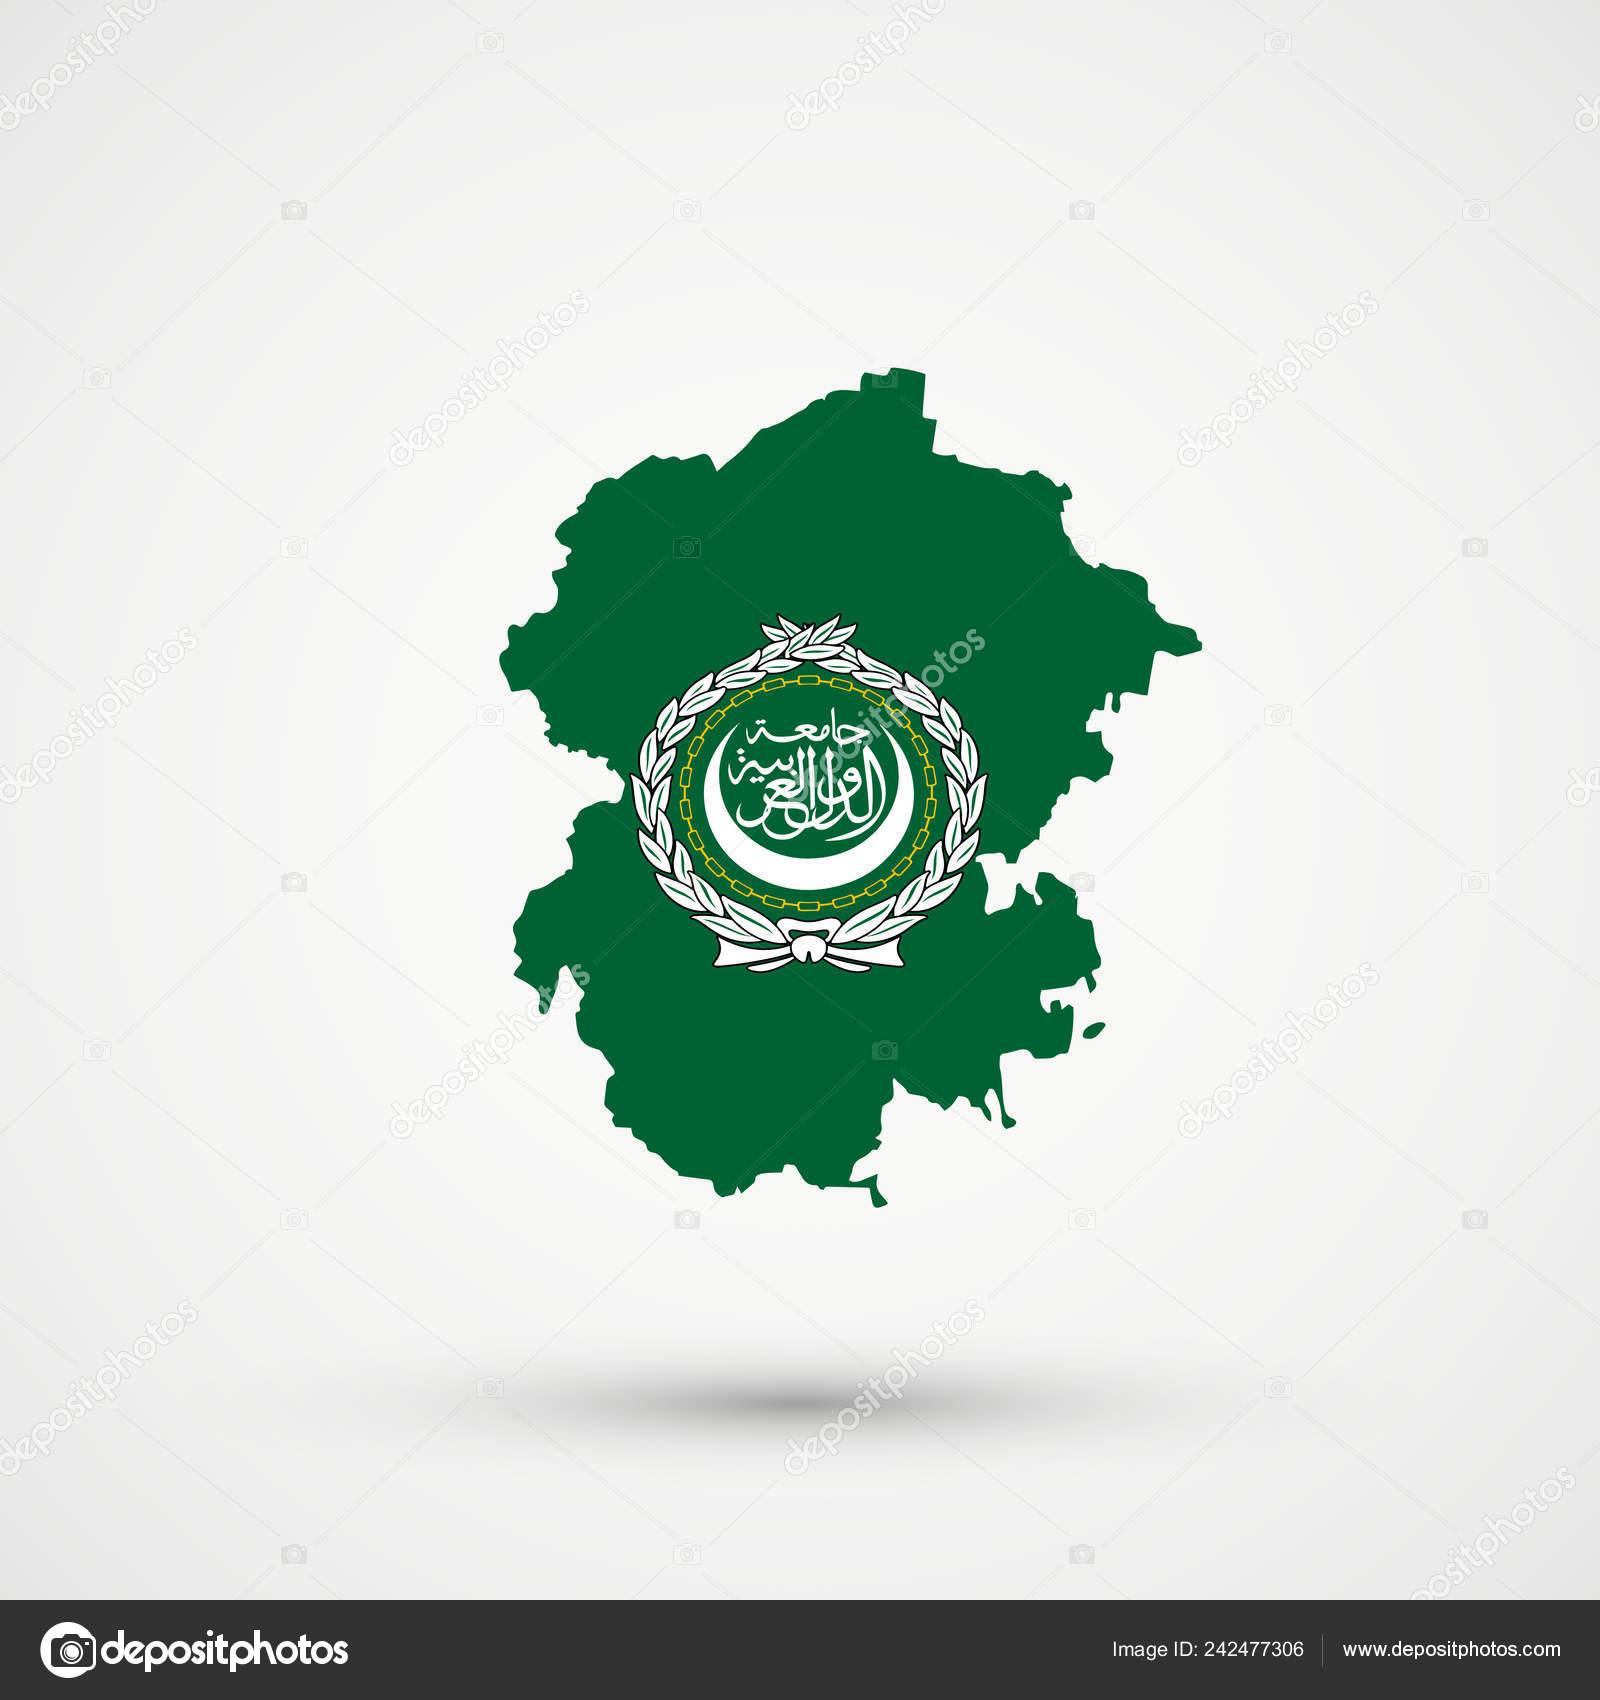 Picture of: Chuvashia Map Arab League Flag Colors Editable Vector Stock Vector C L8l 242477306